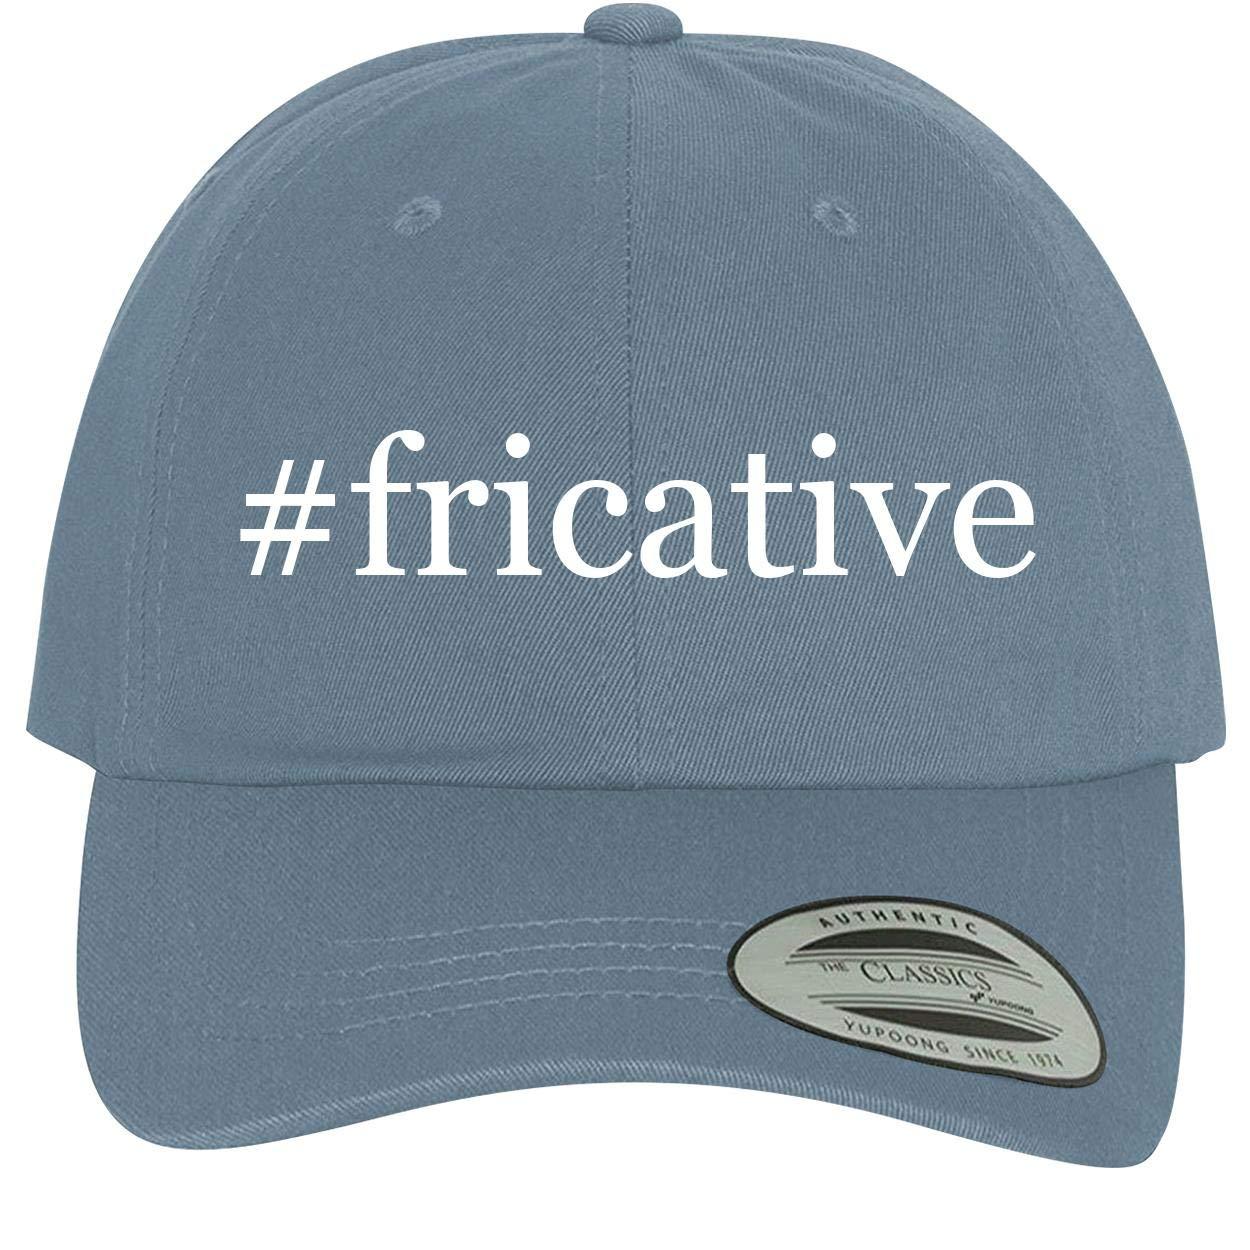 BH Cool Designs #Fricative Comfortable Dad Hat Baseball Cap